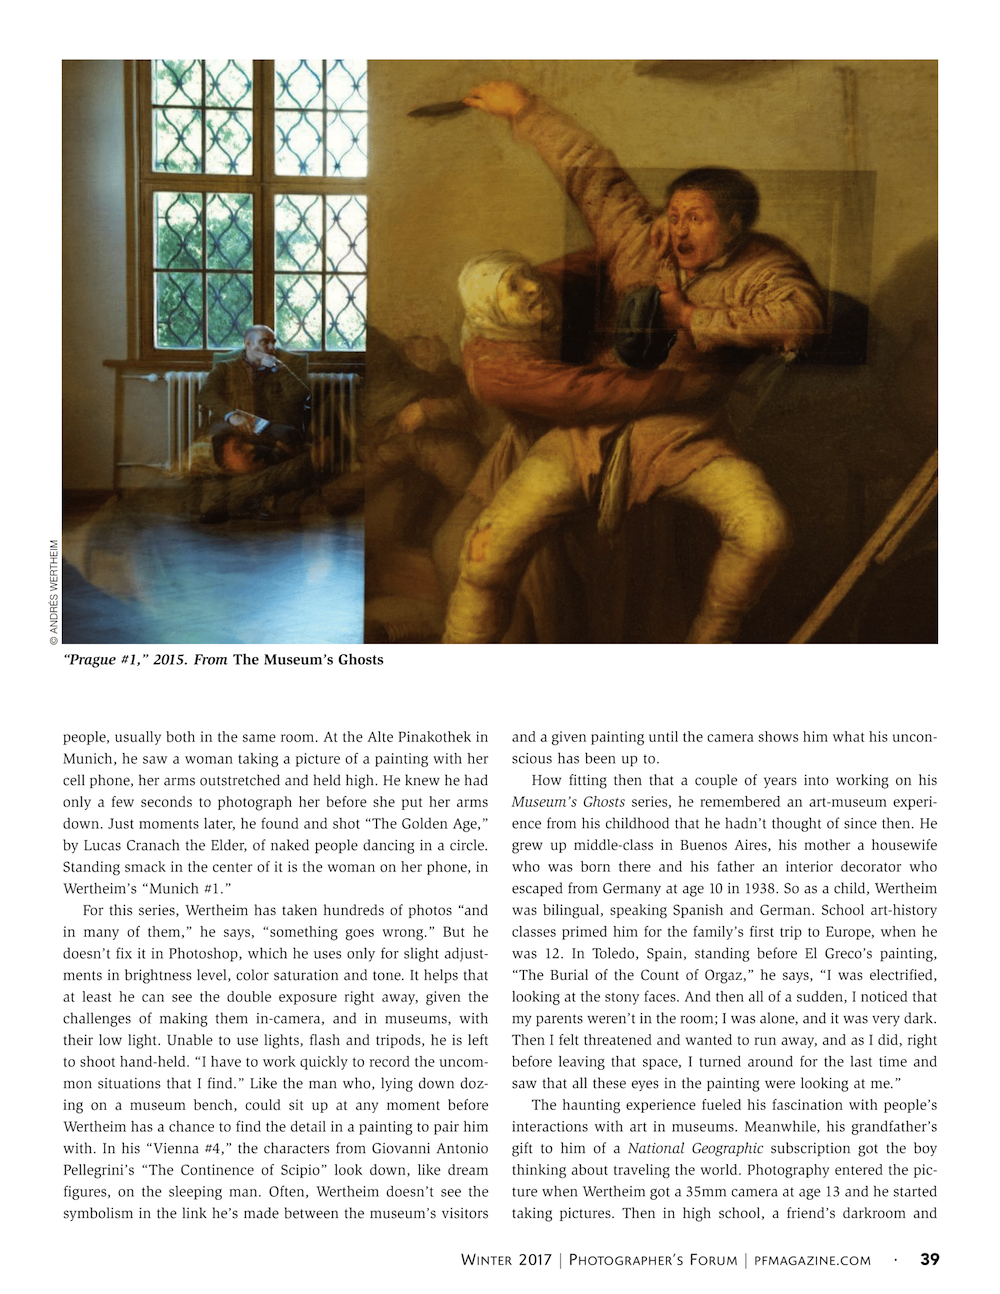 PFNOV17 Wertheim cropped PDF-06.png